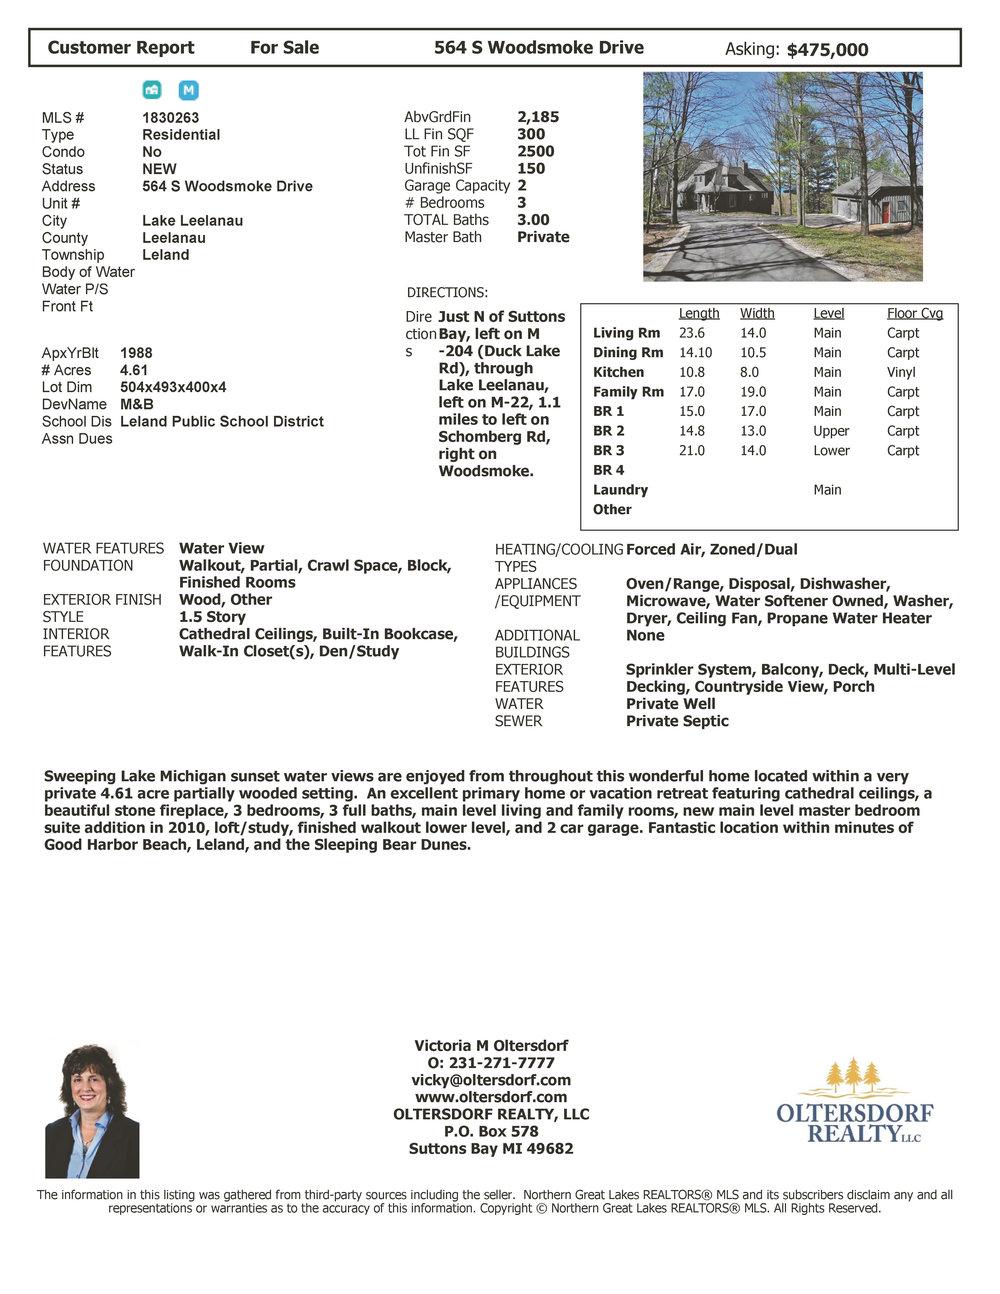 564 S Woodsmoke Drive, Lake Leelanau, MI – Sunset Lake Michigan Water Views - For Sale by Oltersdorf Realty - Marketing Packet (8).jpg